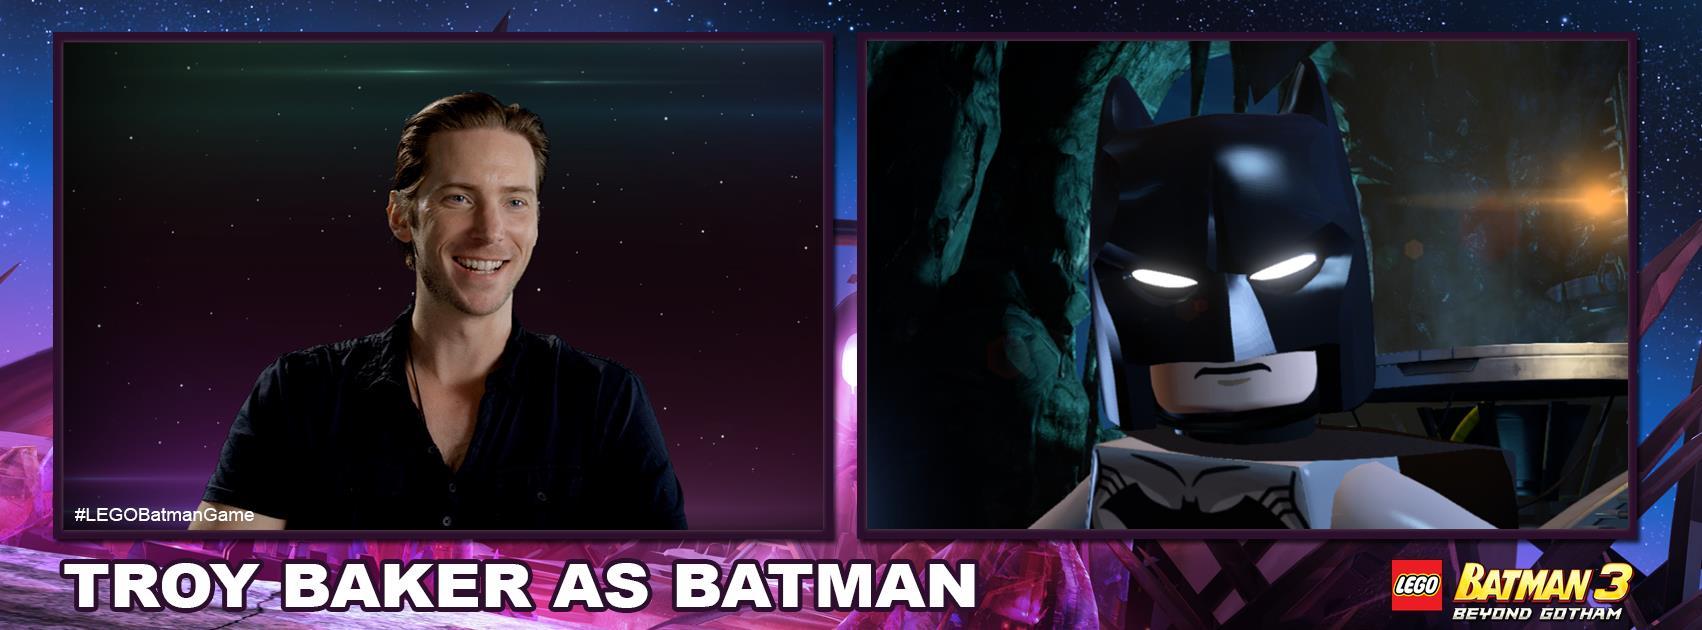 LEGO Batman 3 Cast Details & Many, Many Screens